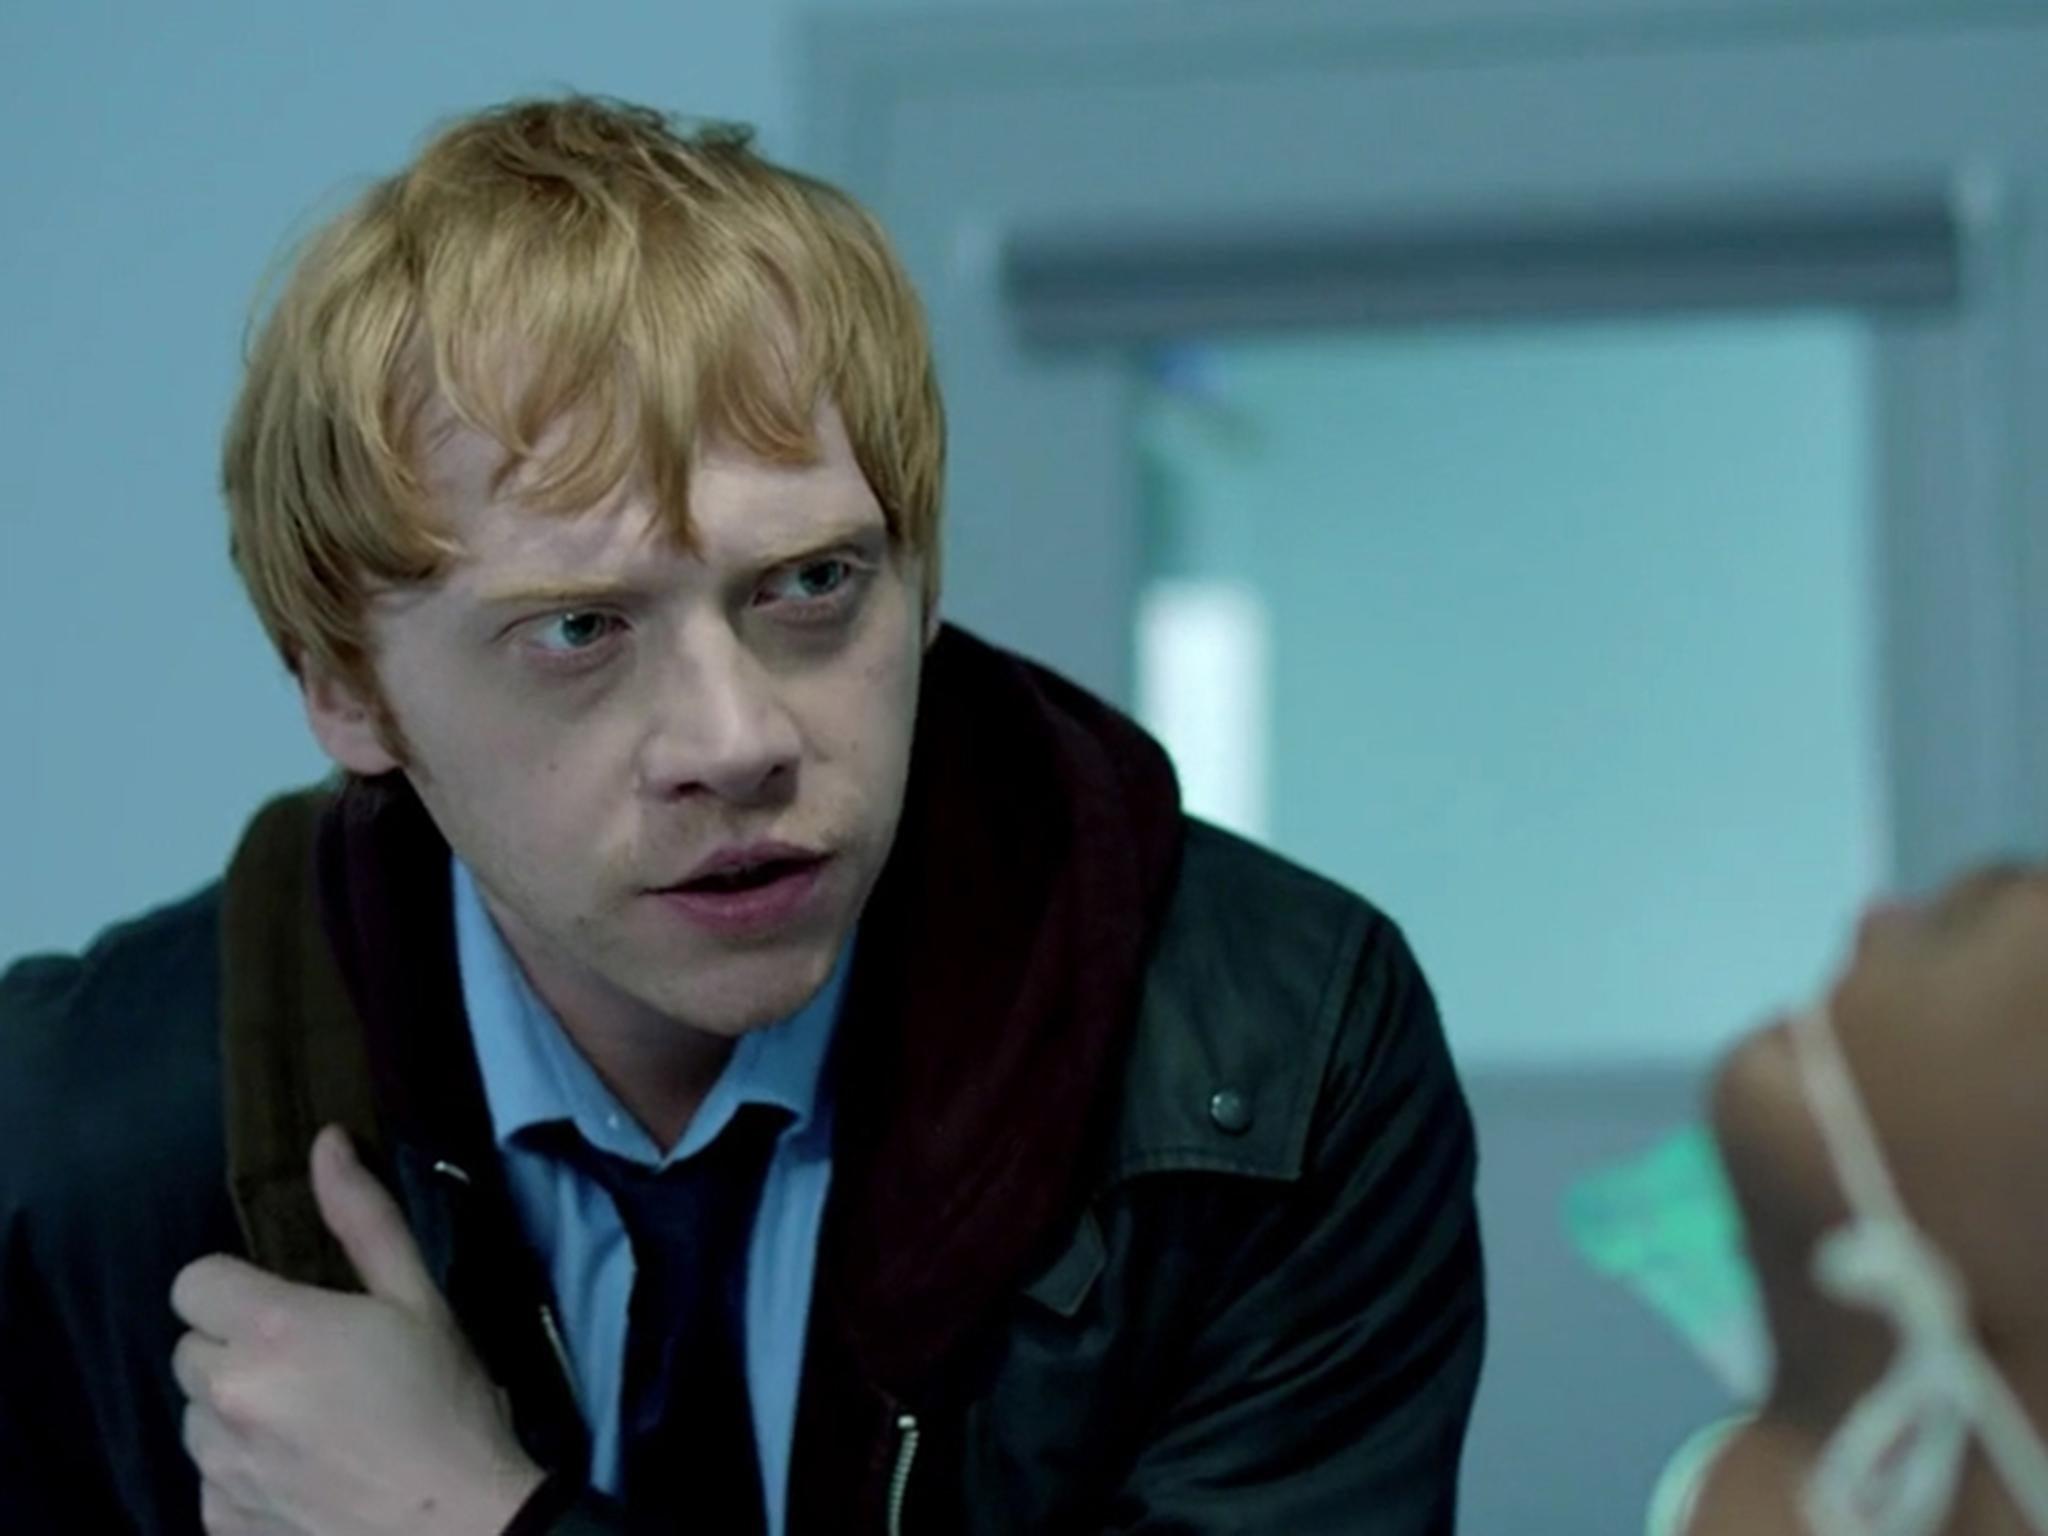 Sick Note's Rupert Grint: After Harry Potter, I want the ... руперт гринт